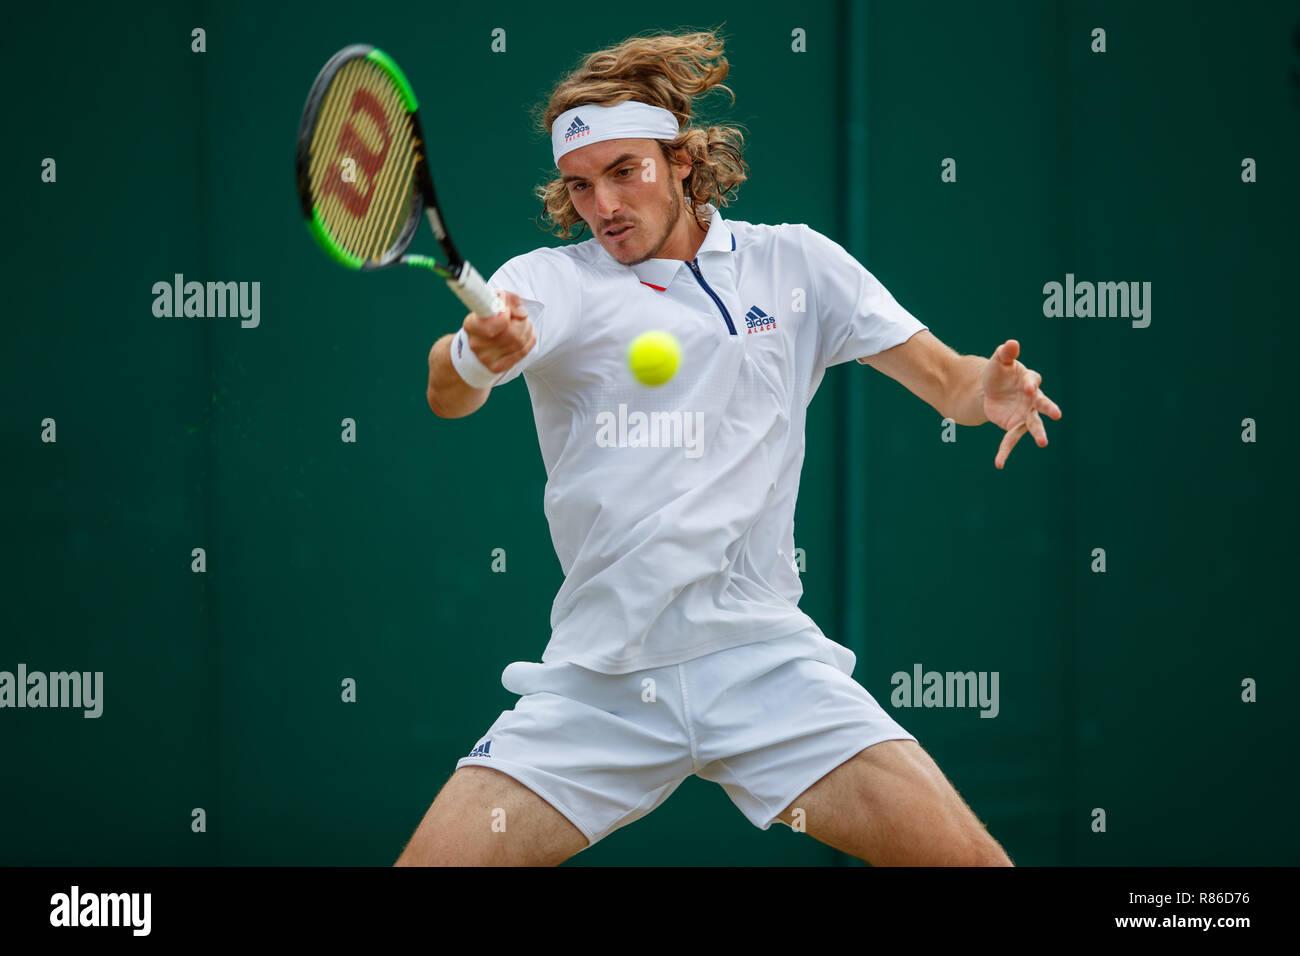 Stefanos Tsitsipas de Grecia en acción durante el Campeonato de Wimbledon 2018 Foto de stock